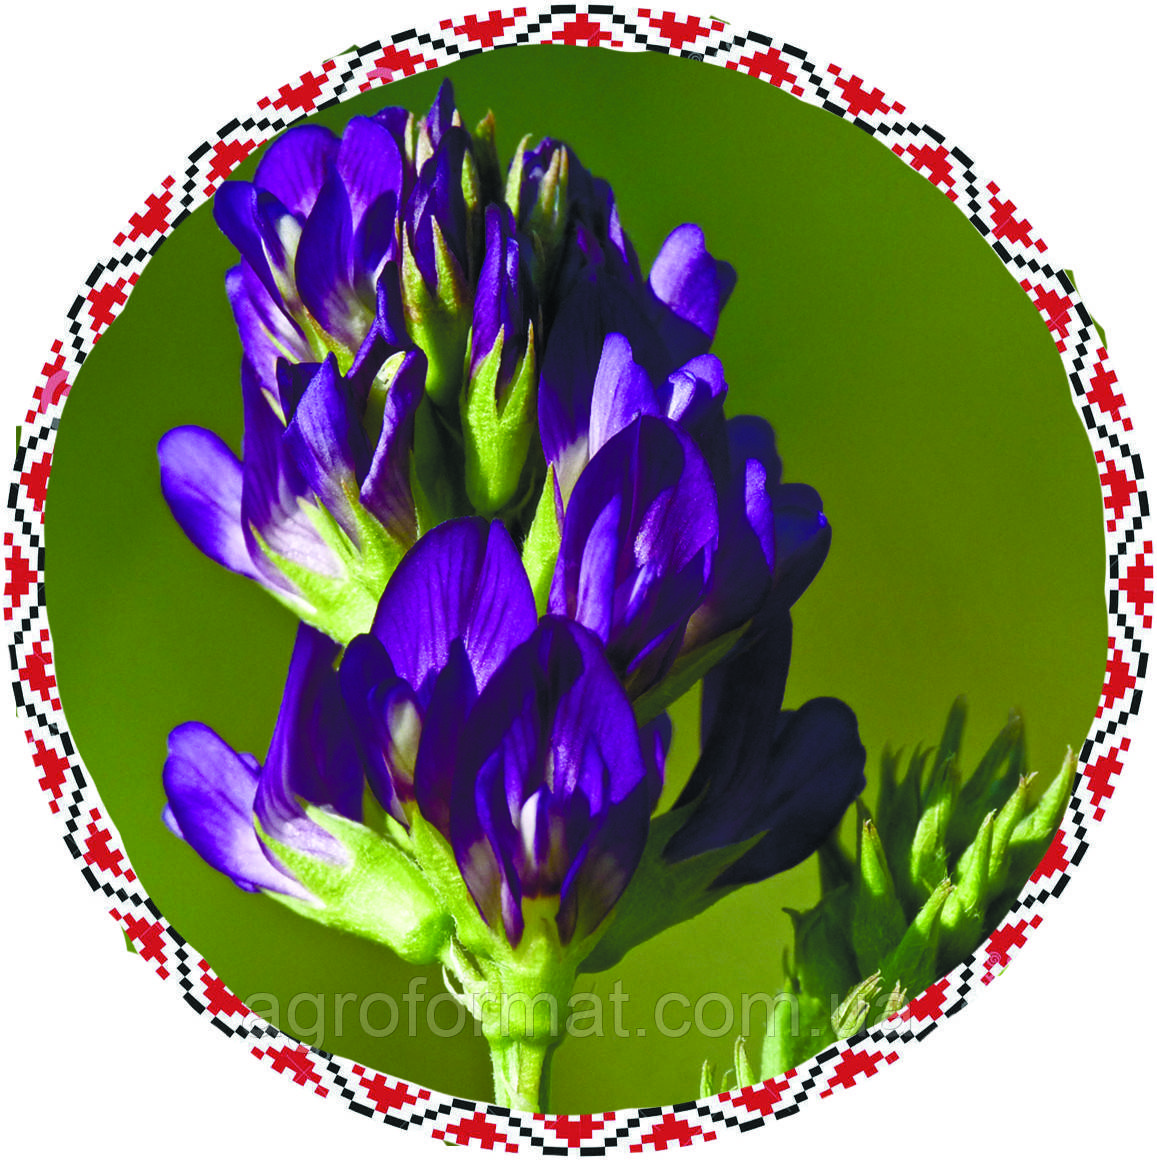 Семена люцерны  (магниченная) от 1 кг